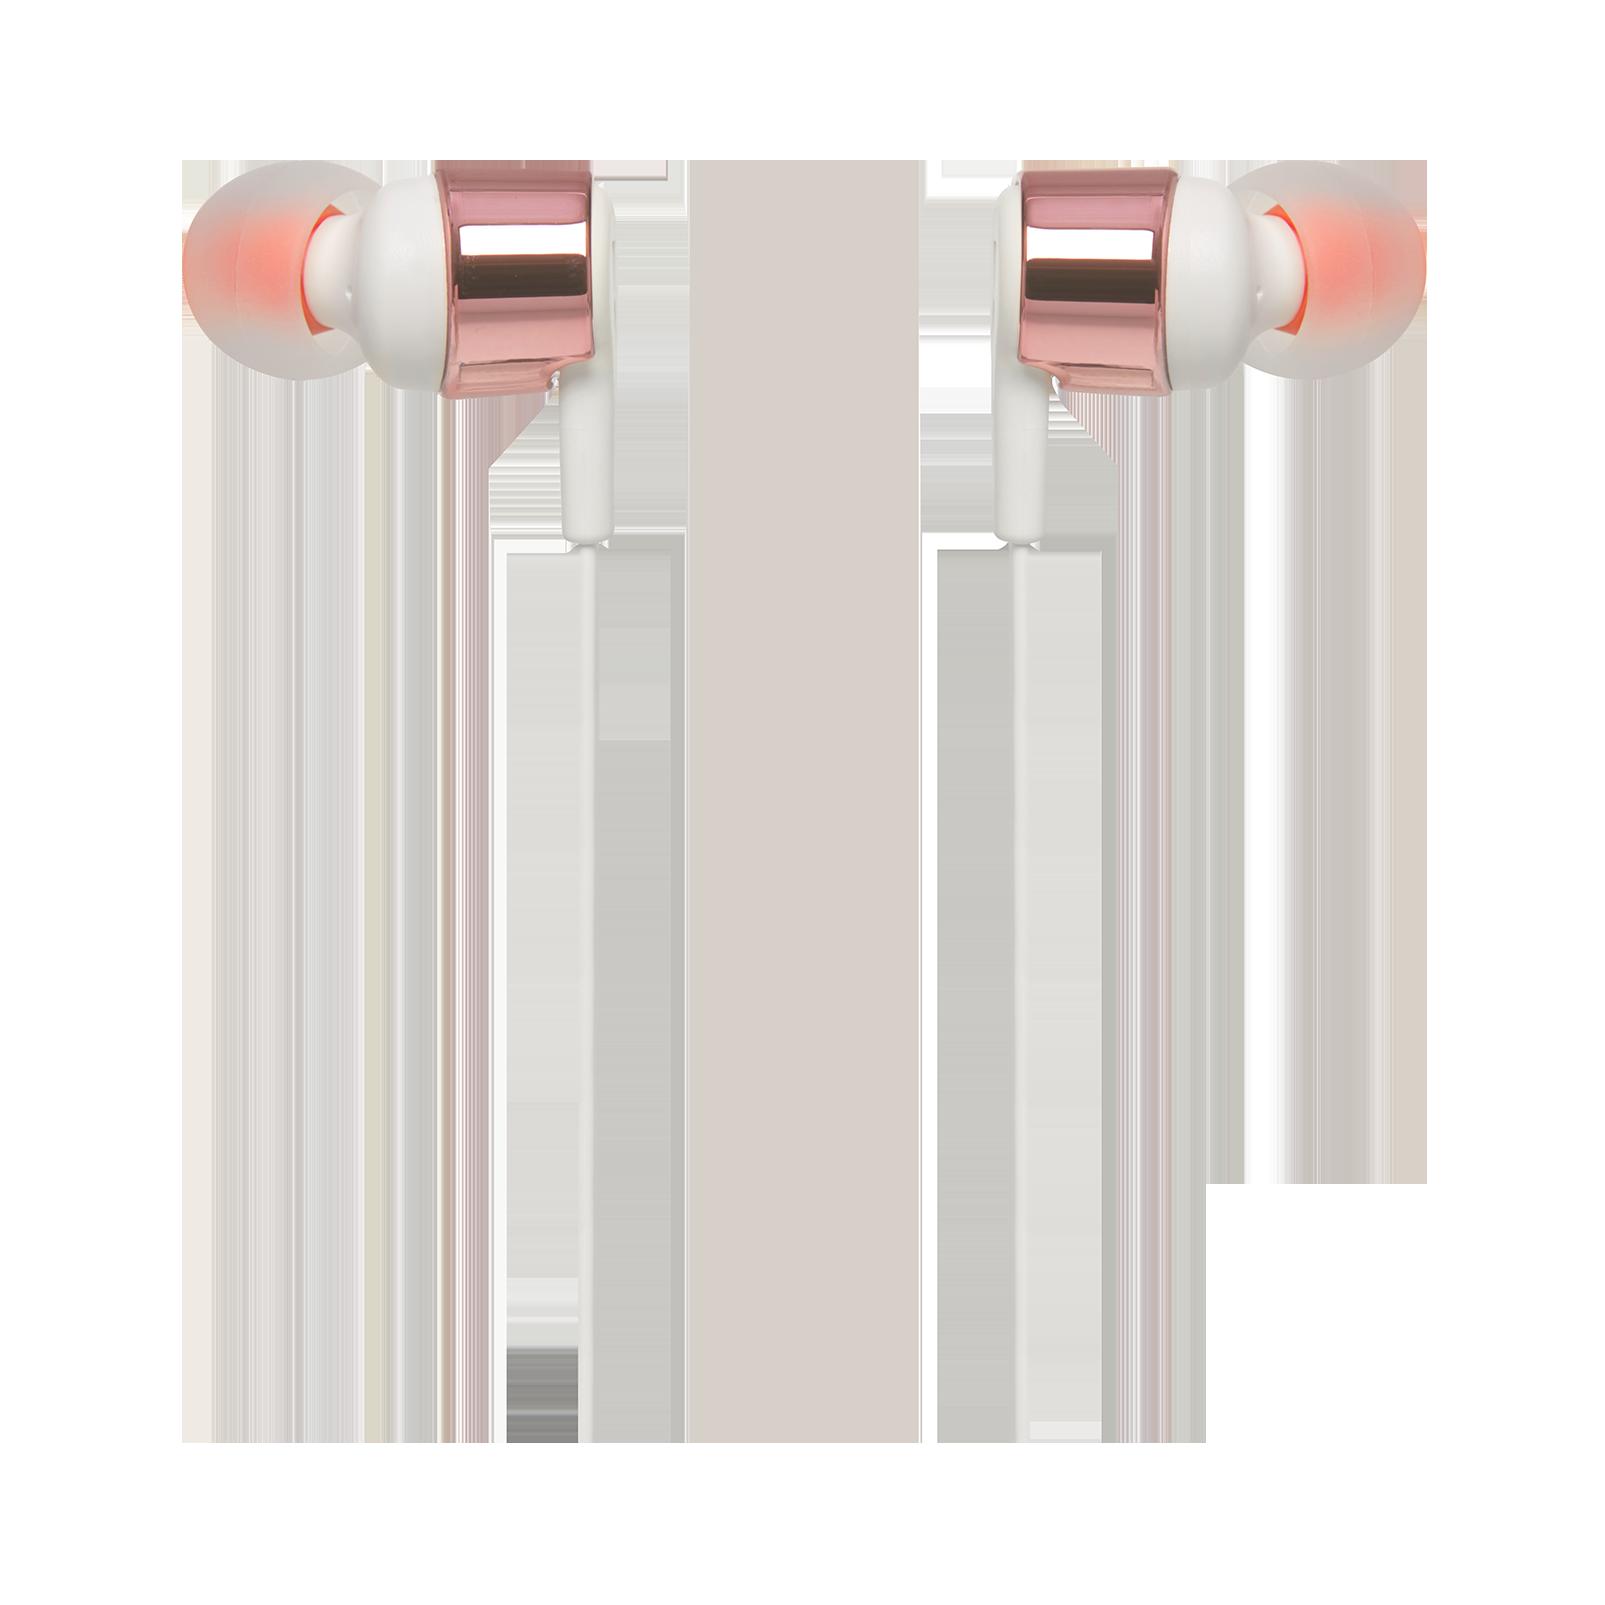 JBL TUNE 210 - Rose Gold - In-ear headphones - Detailshot 1